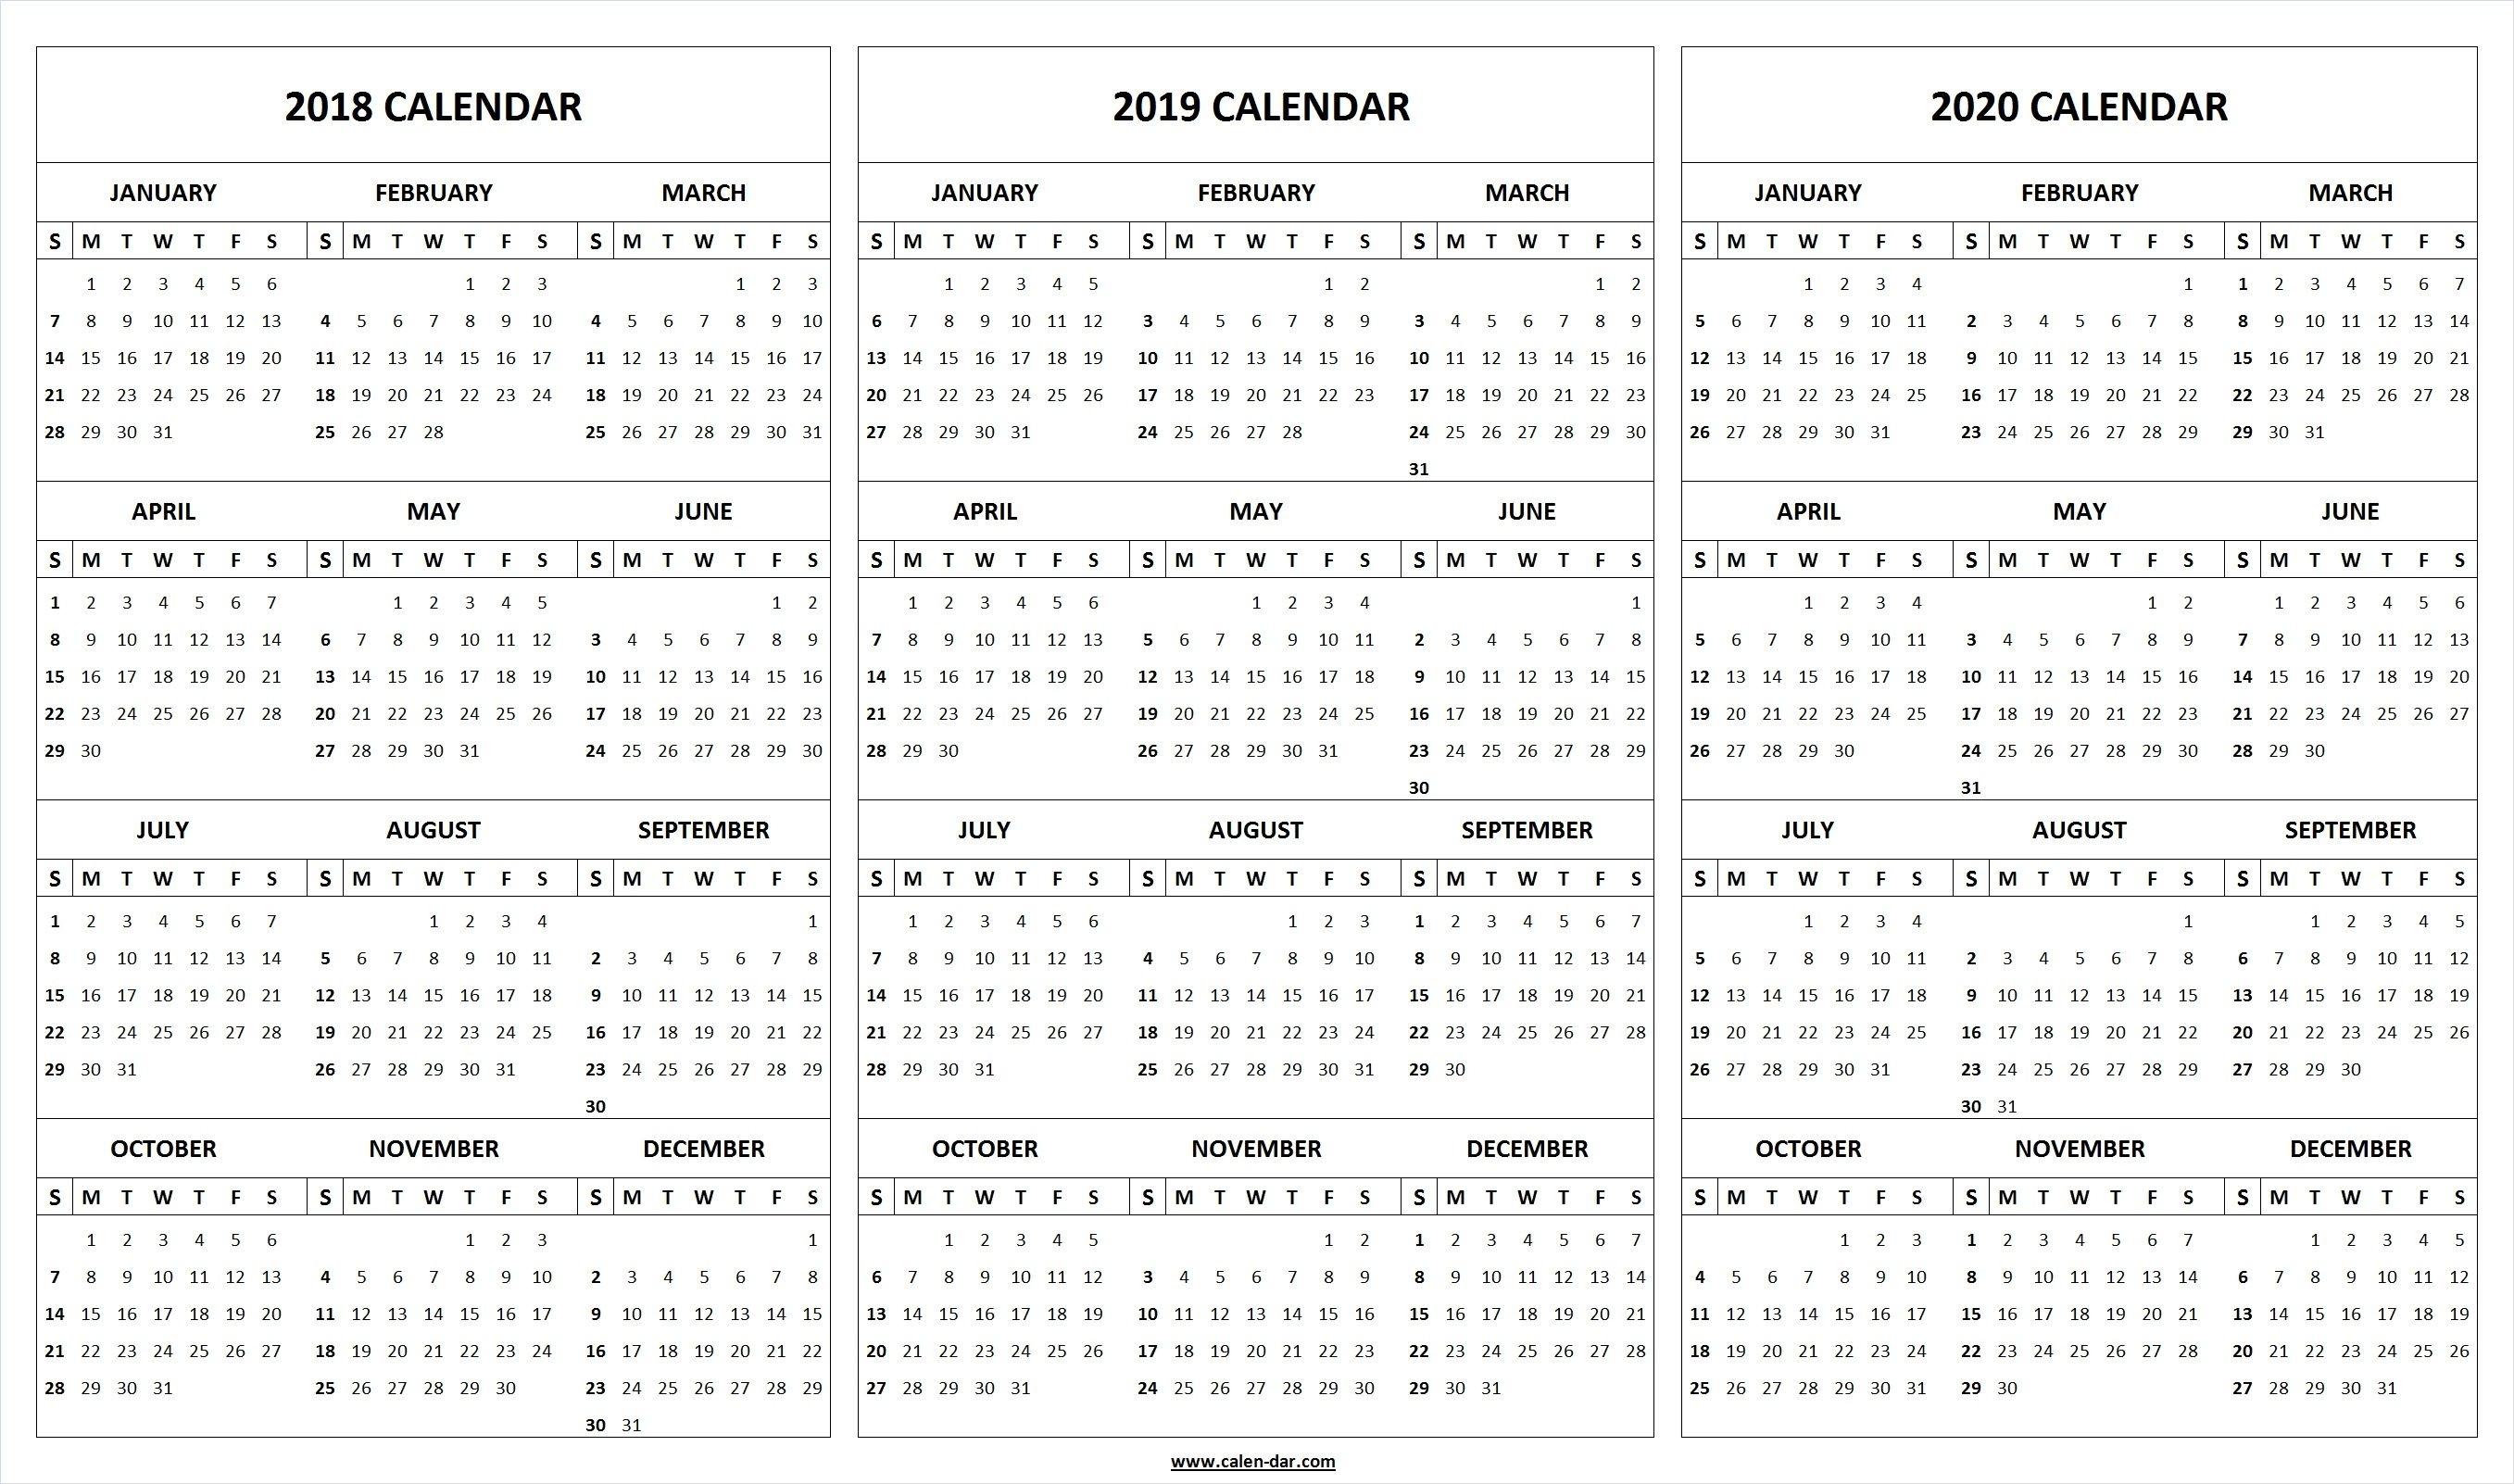 Print Blank 2018 2019 2020 Calendar Template | Organize! | Printable intended for Printable 3 Year Calendar 2019 2020 2021